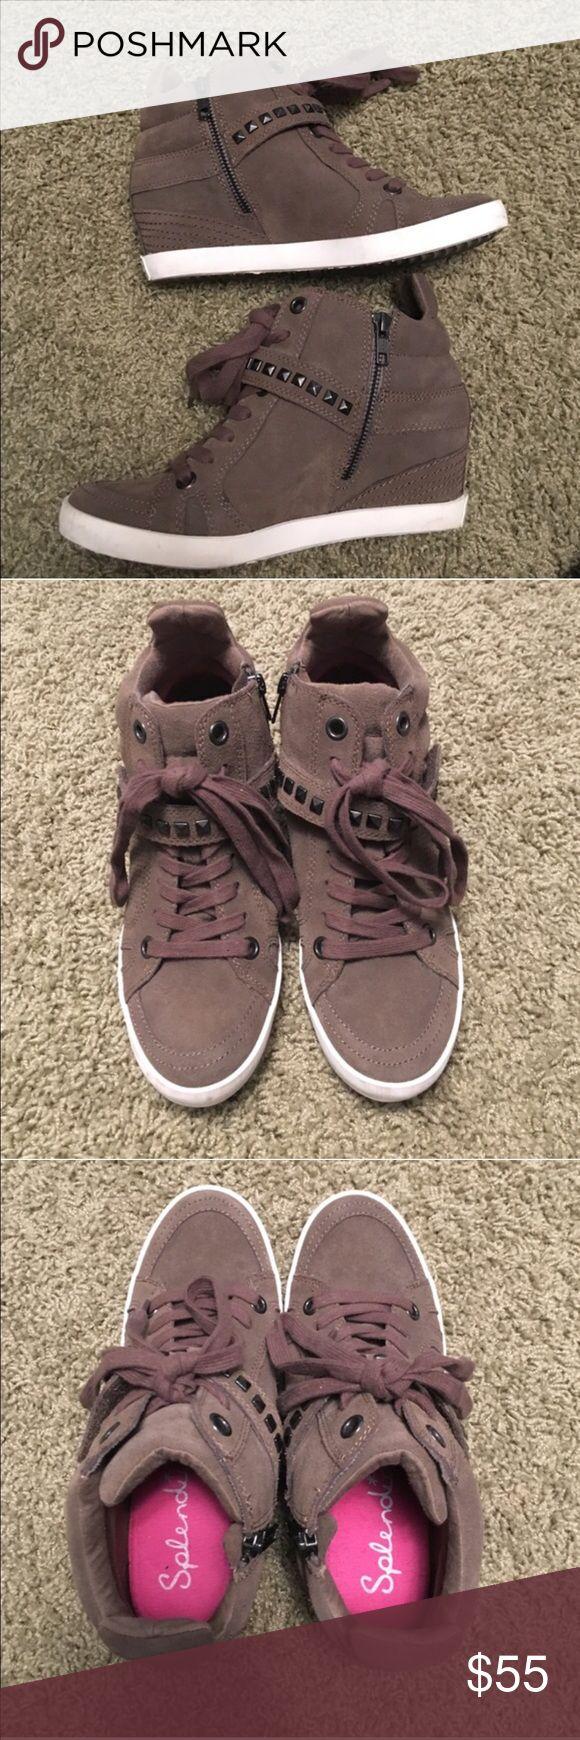 Splendid Hayden Wedge sneaker Only worn twice. In great condition as seen in photos. Splendid Shoes Sneakers